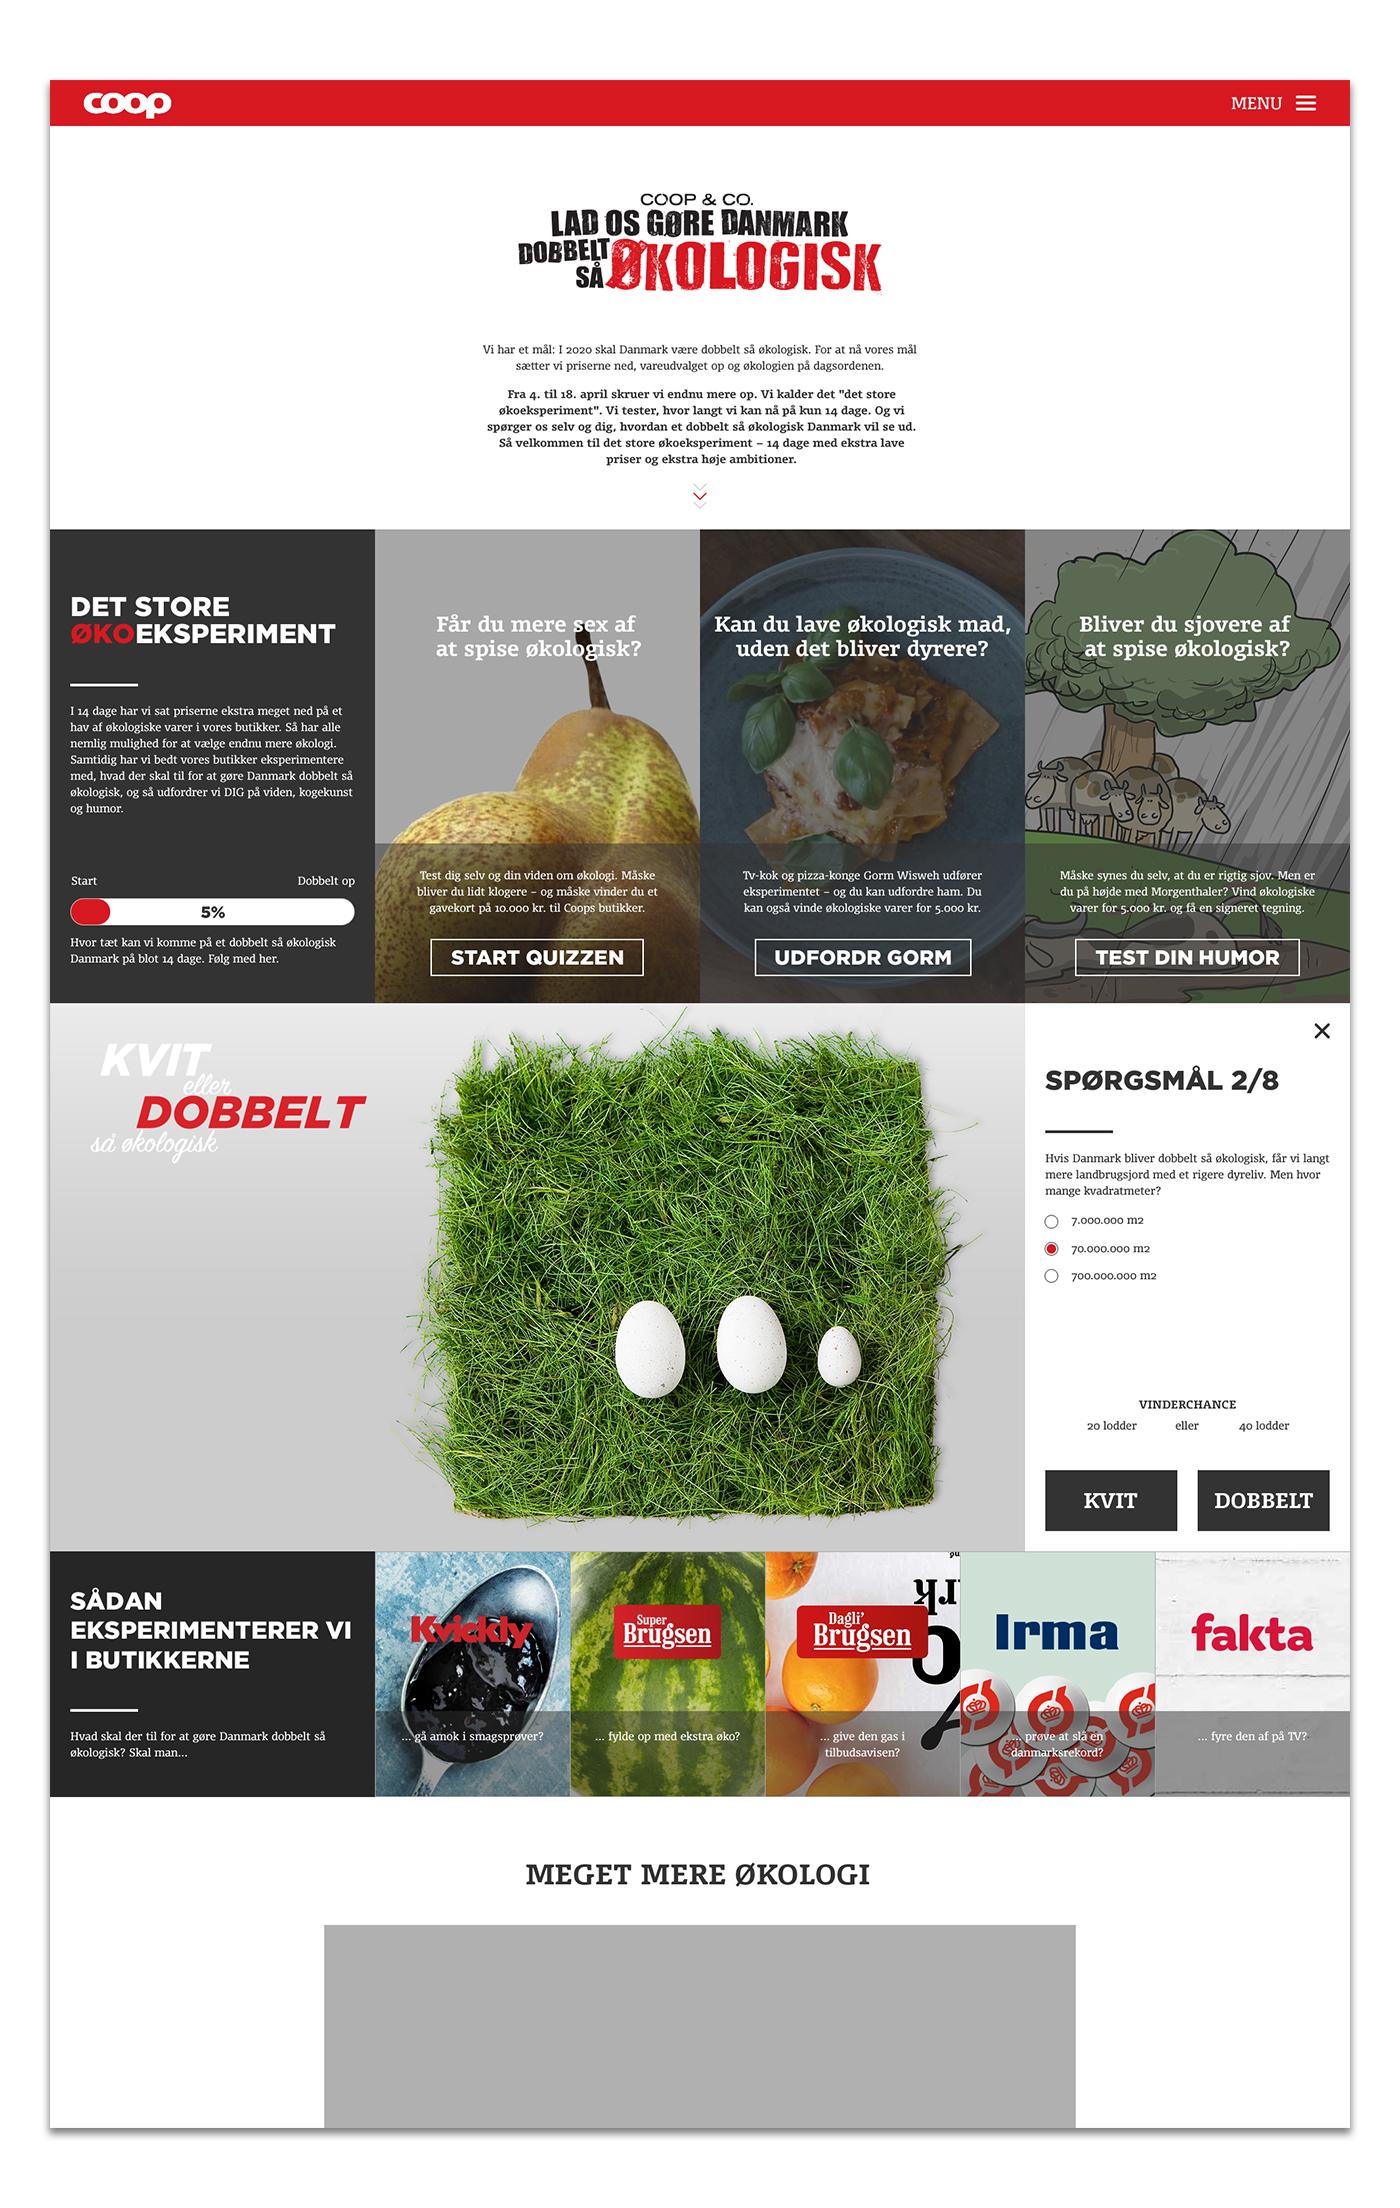 ux UI photoshop Illustrator Interaction design  graphic design  digital design branding  campaign